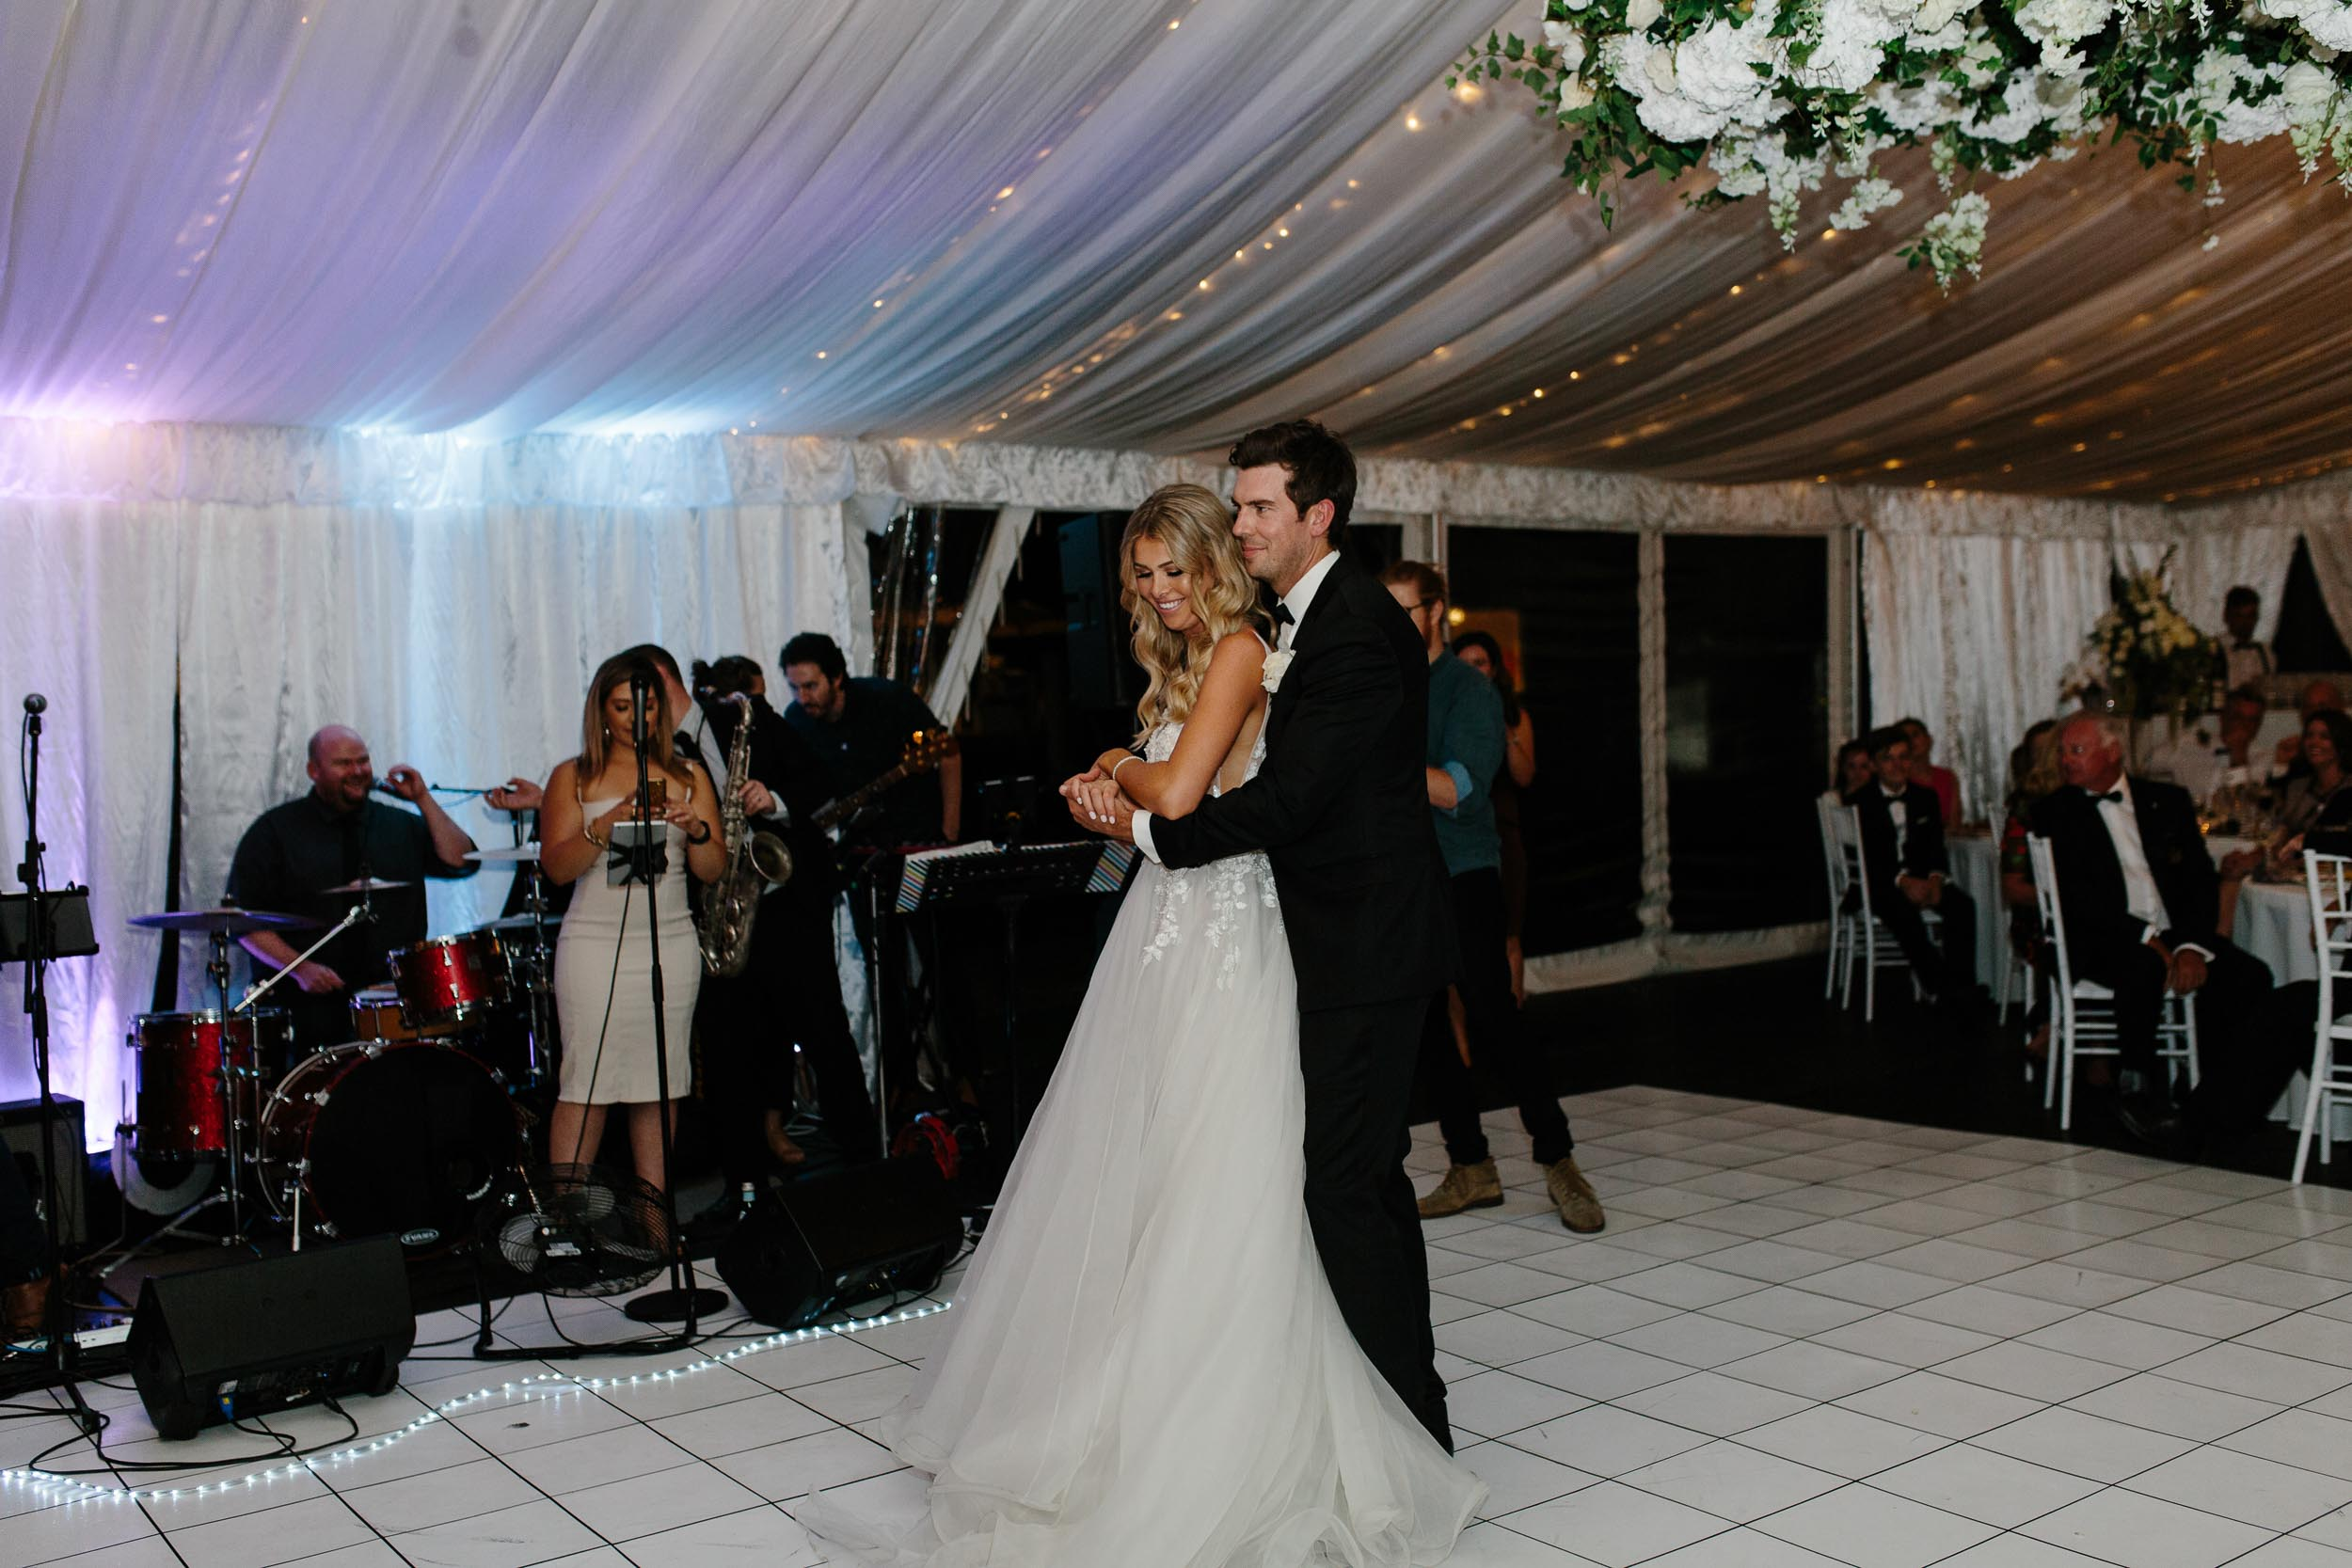 Kas-Richards-Mornington-Peninsula-Private-Property-Wedding-Marianna-Hardwick-Gown-791.jpg